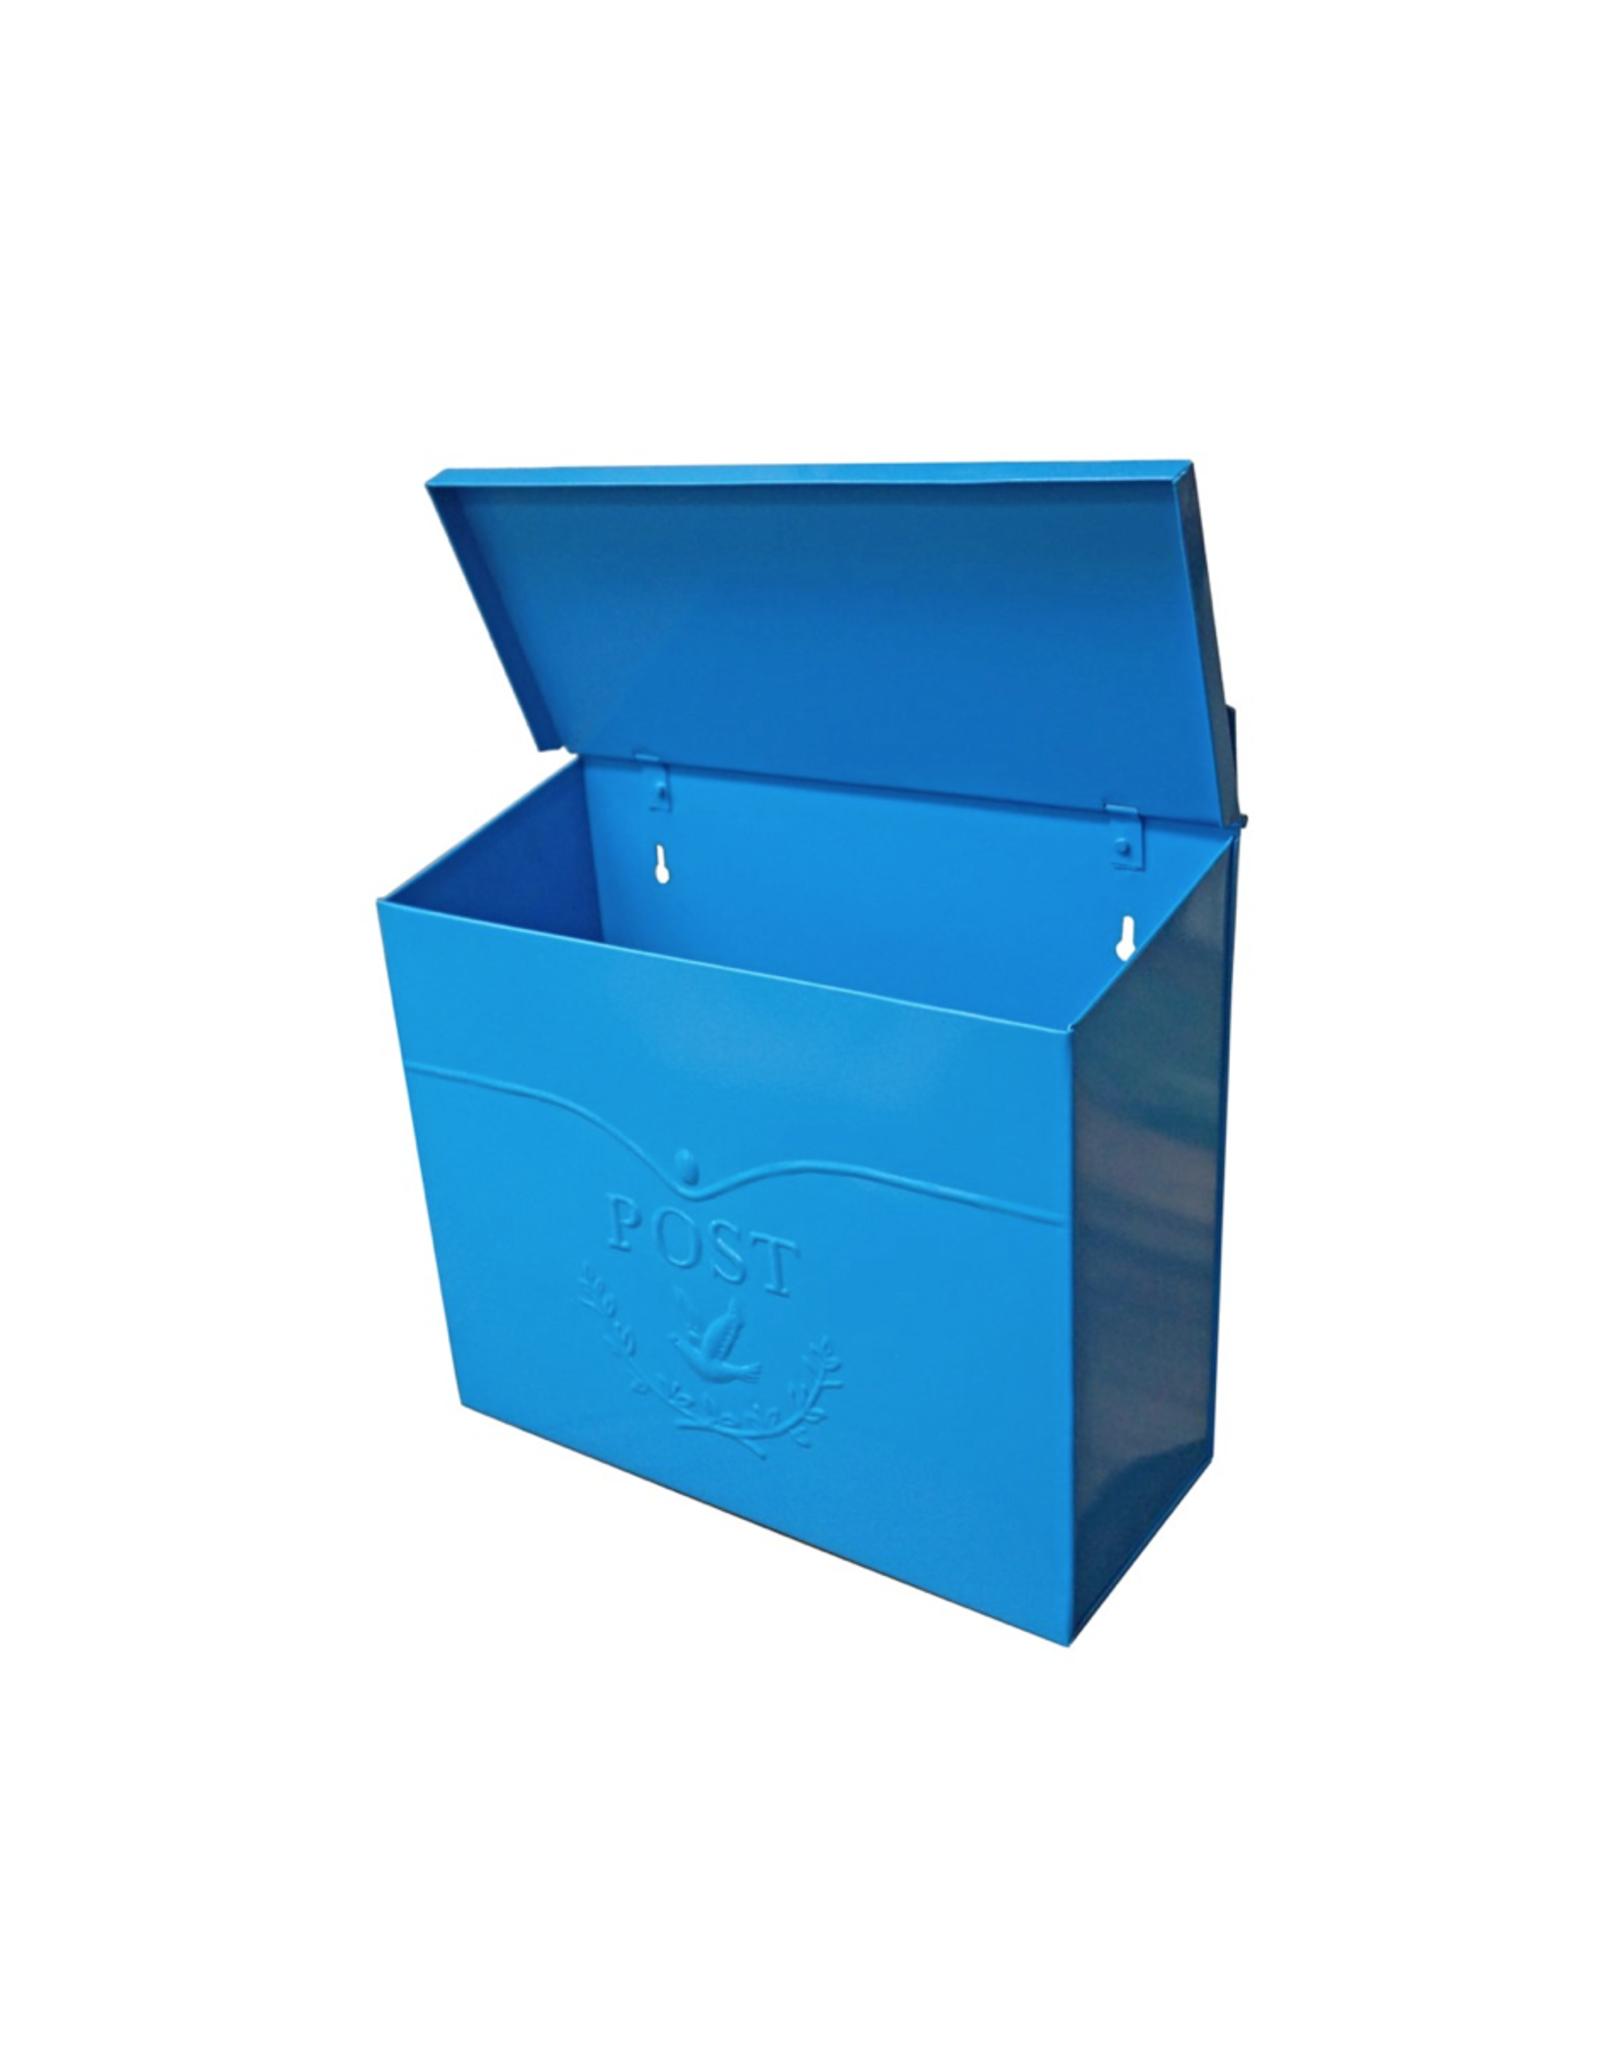 NTH - Post Mailbox/Embossed Bird, Blue